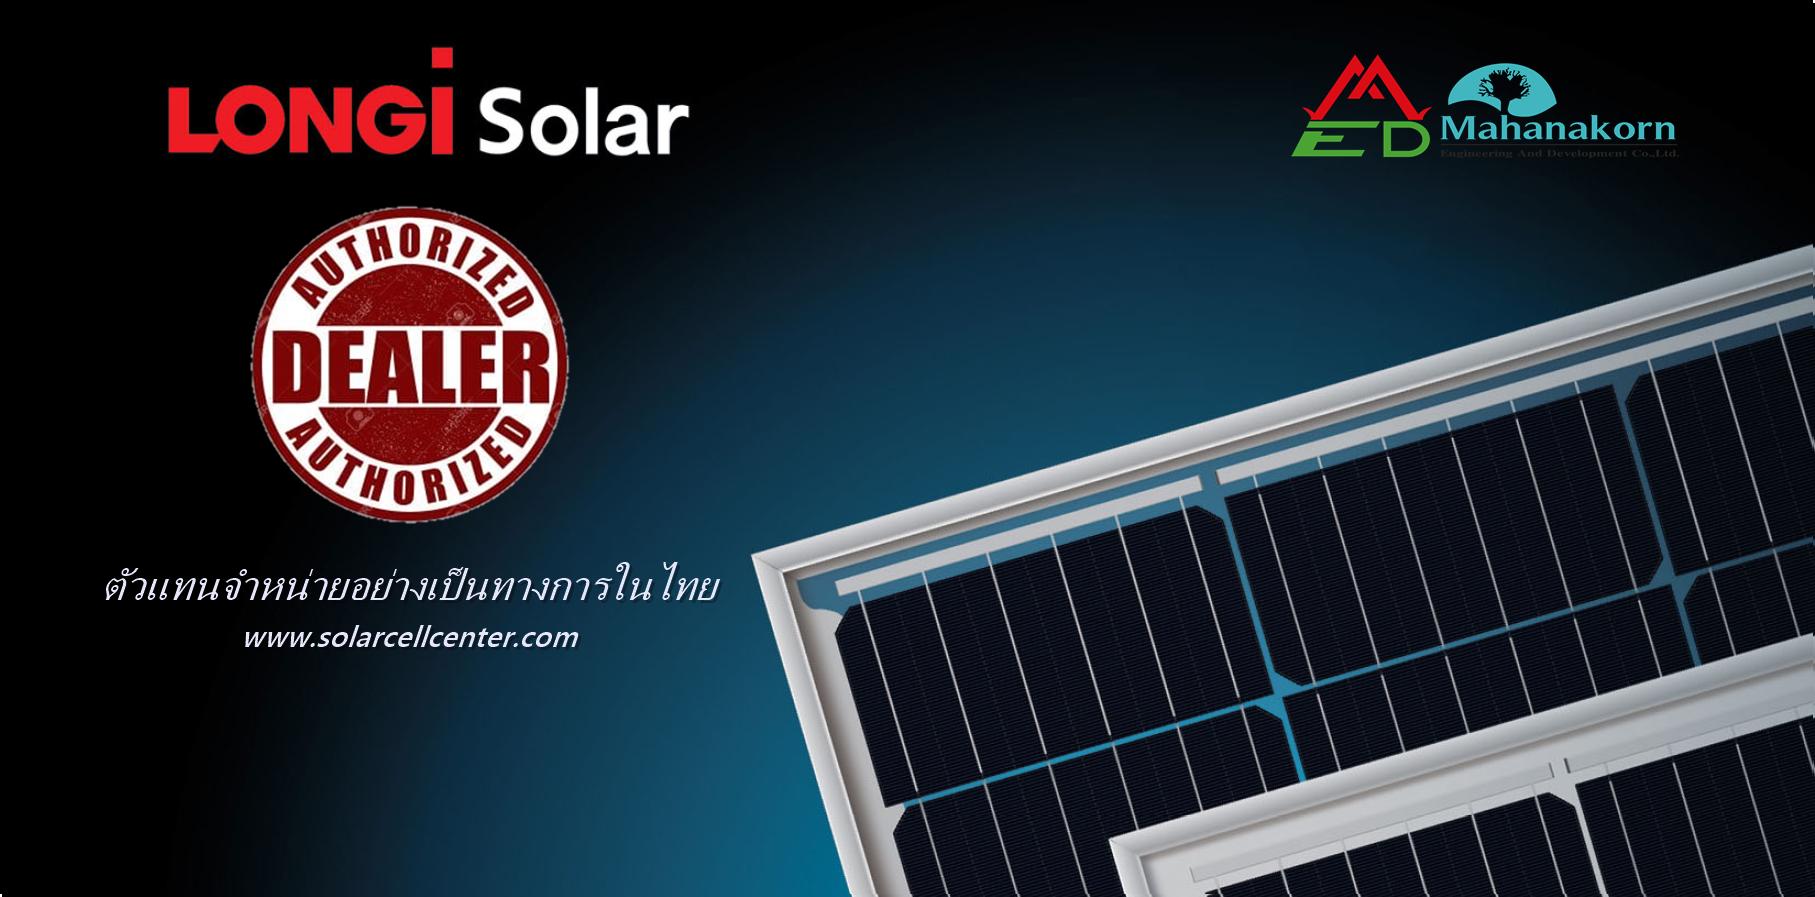 http://solarcellcenter.com/img/cms/web design/Longi Solar Authorized Dealer.PNG